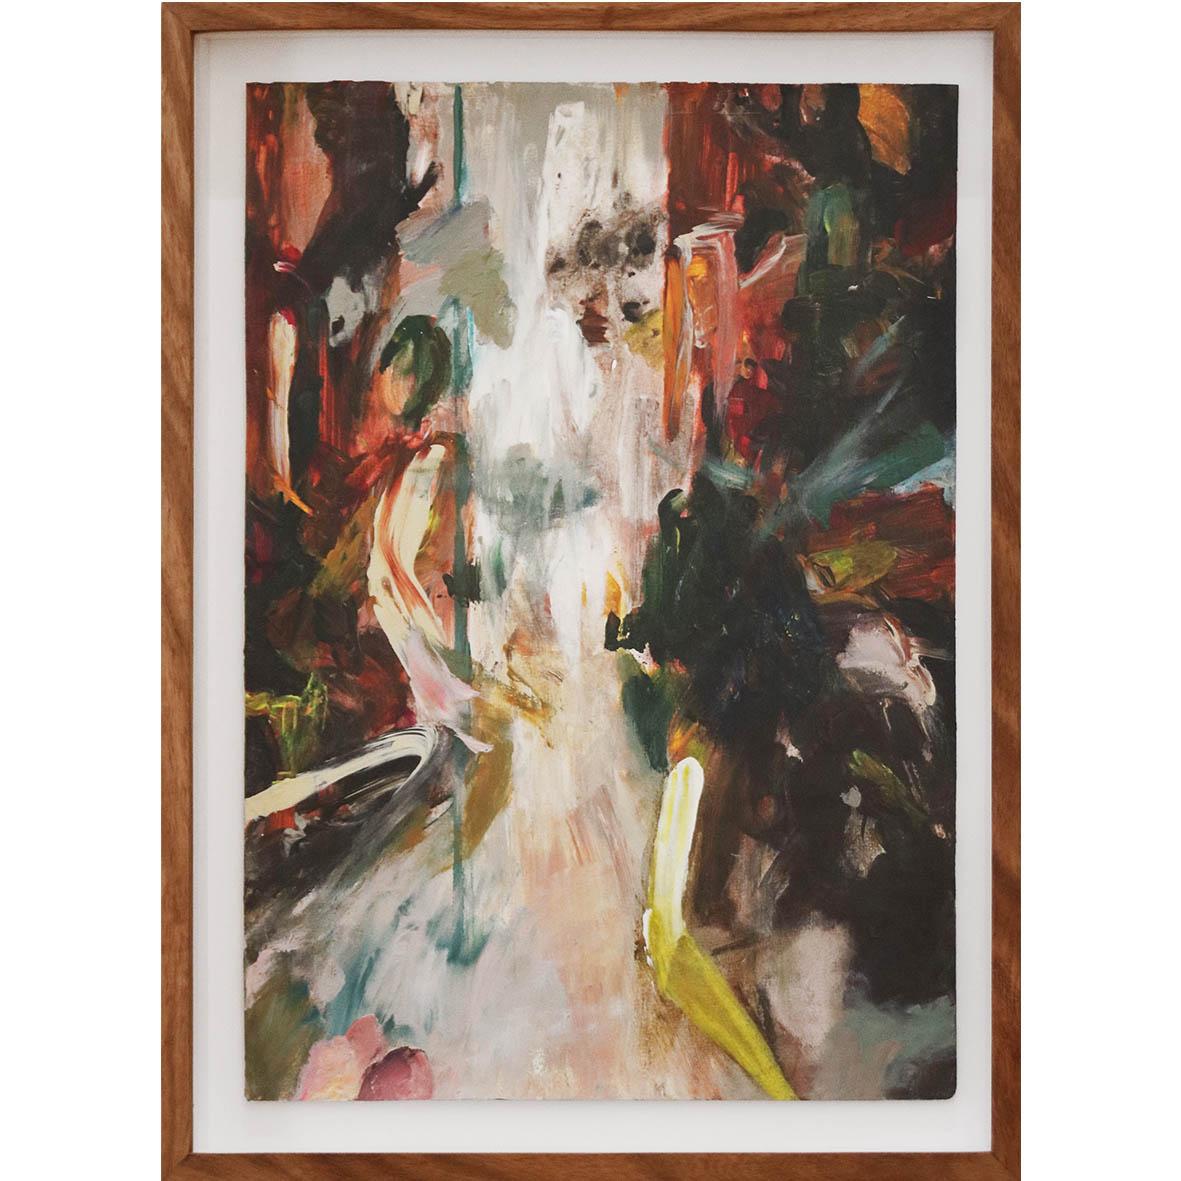 Nina Holmes New Promises 2019 Acrylic on paper 47 x 35 cm